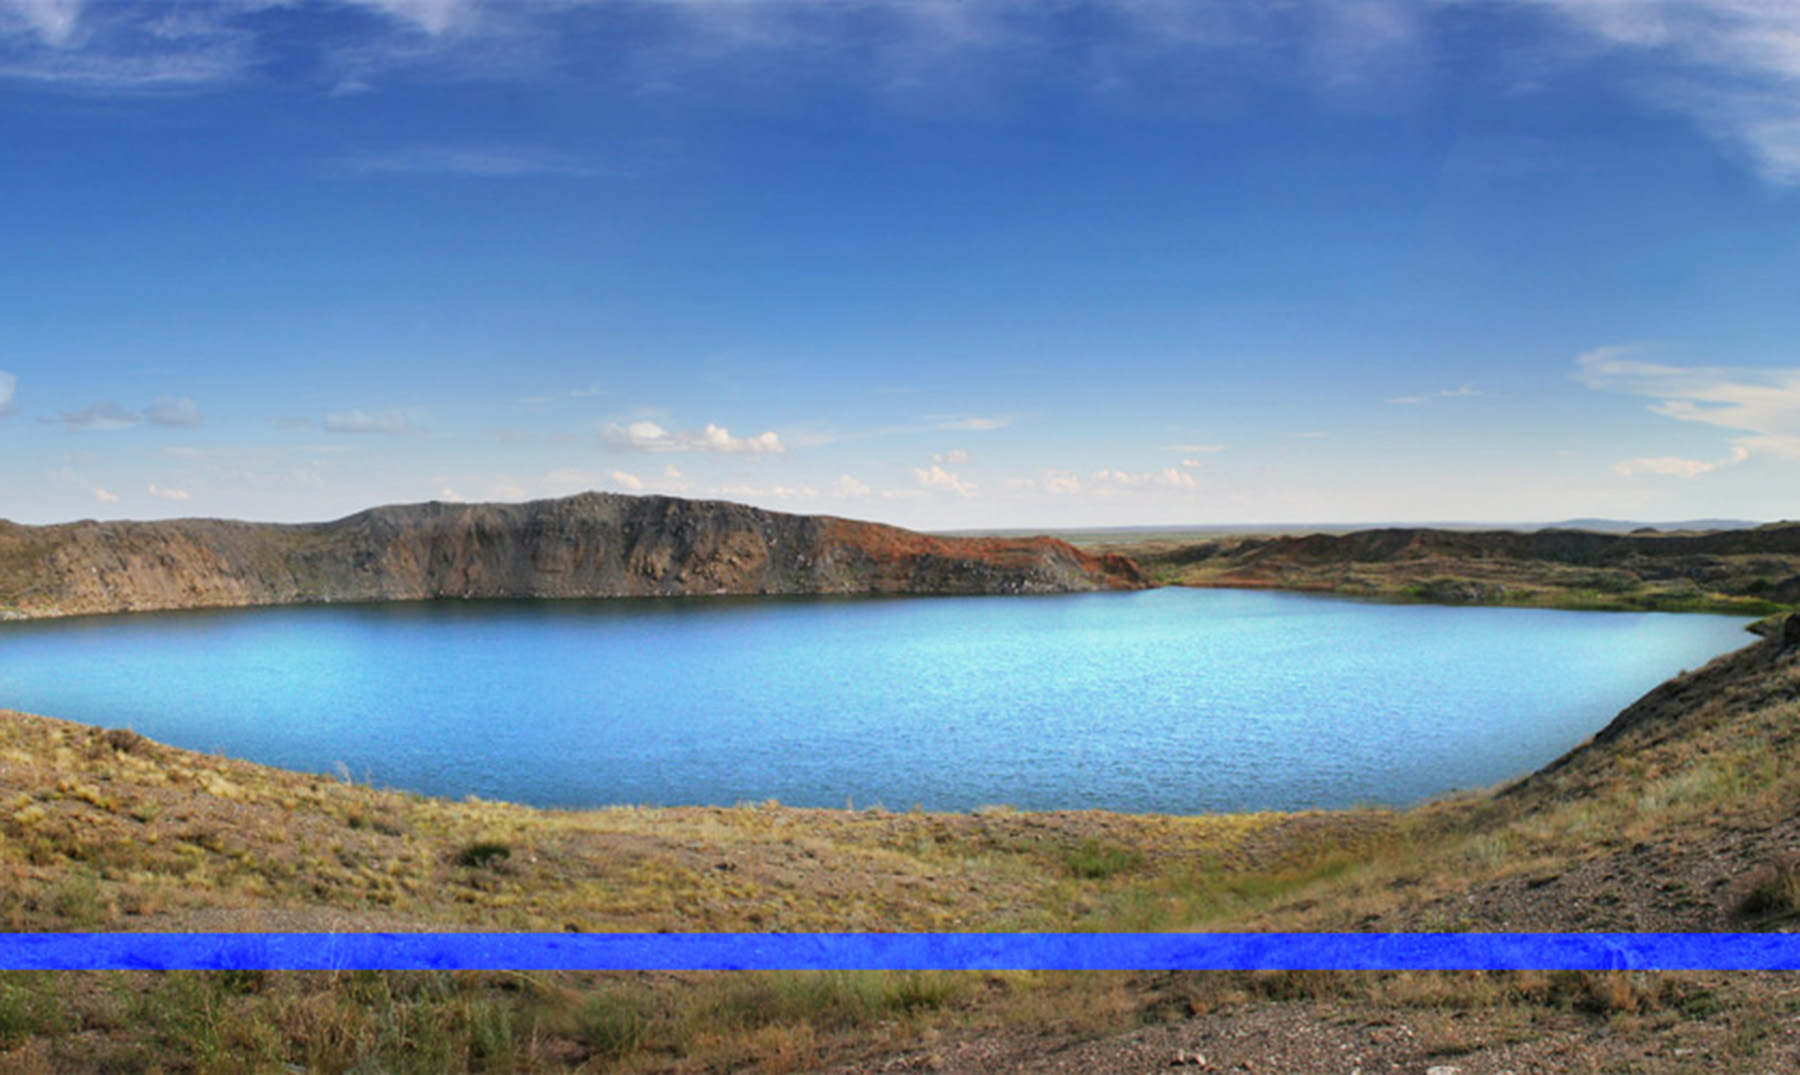 lago chagan portada